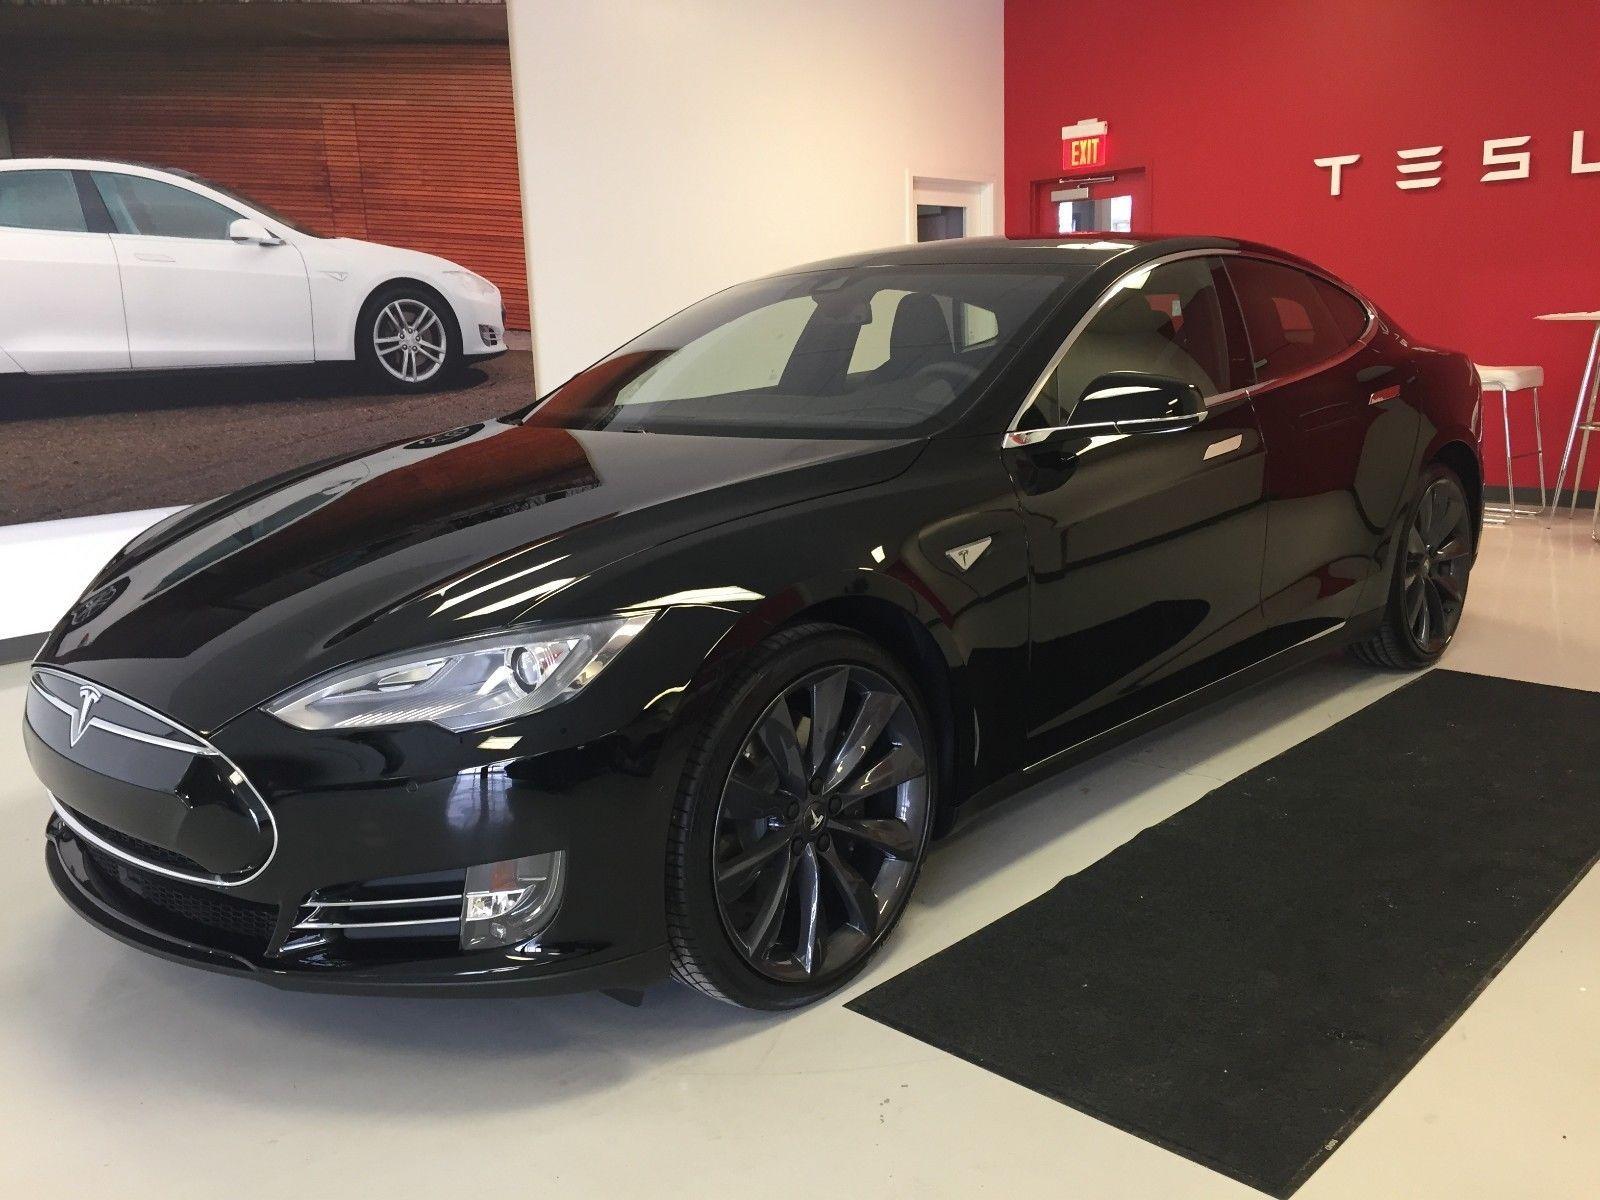 2015 Tesla Model S 60 2015 Tesla Model S - 60, with Auto Pilot, 1 ...